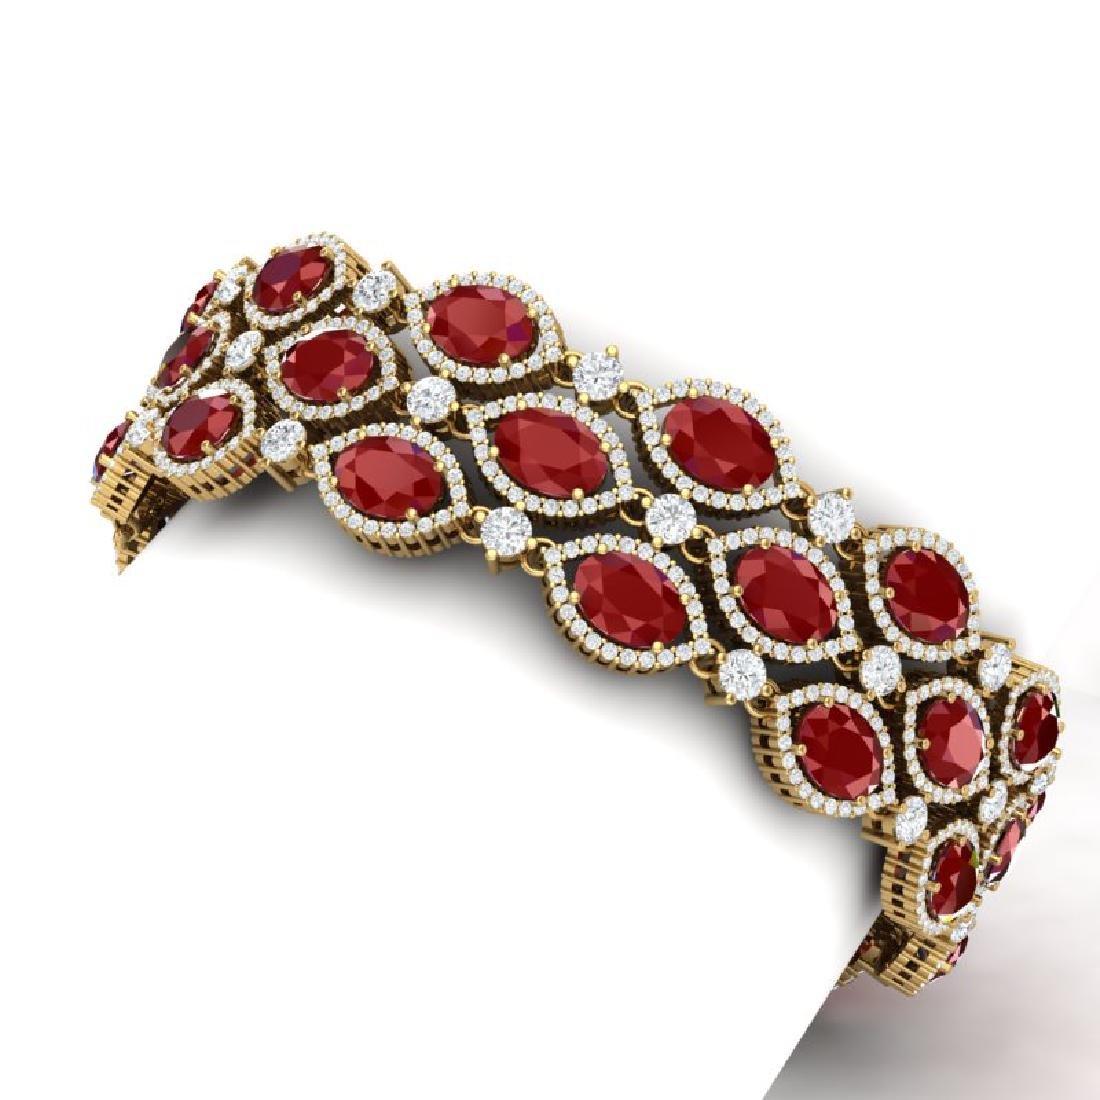 47.84 CTW Royalty Ruby & VS Diamond Bracelet 18K Yellow - 2